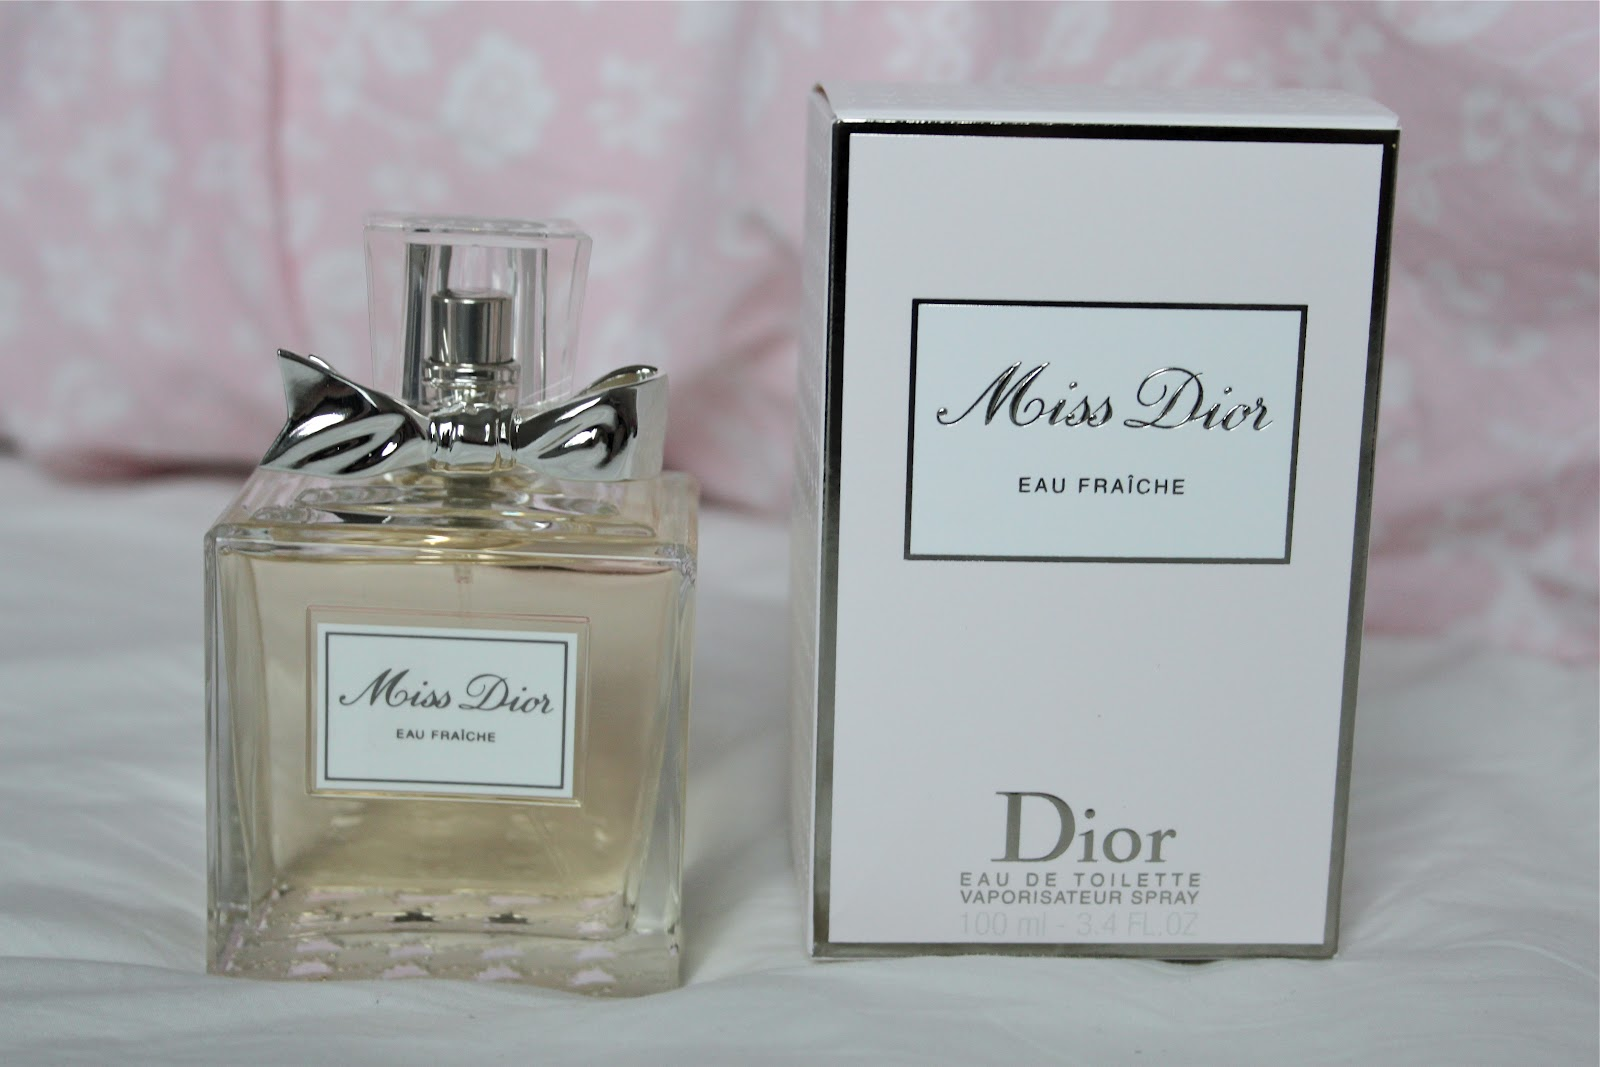 dior perfume wallpaper - photo #27